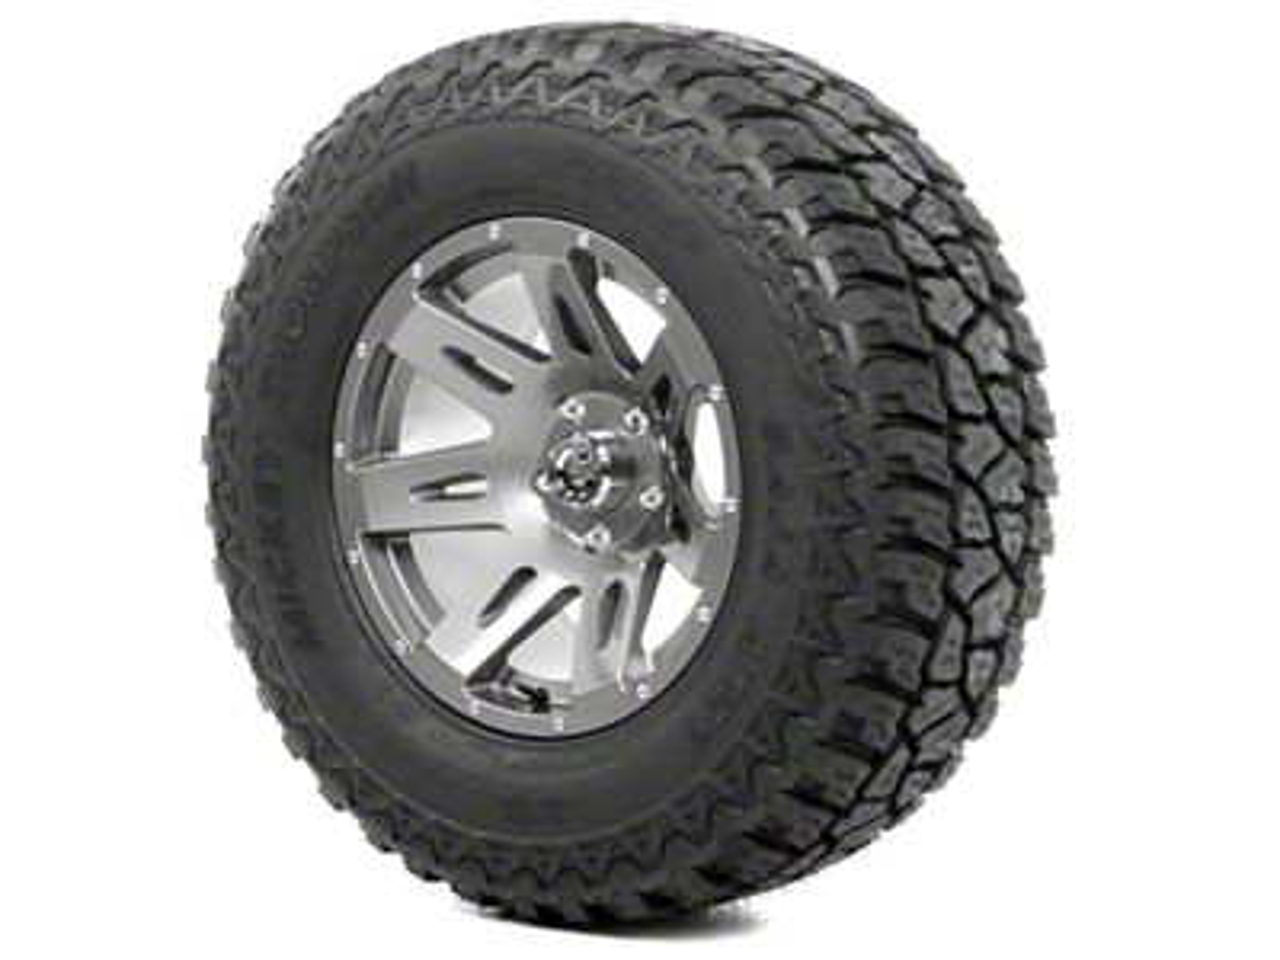 Rugged Ridge XHD Wheel 17x9 Gun Metal and Mickey Thompson ATZ P3 315/70R17 Tire Kit (13-18 Jeep Wrangler JK; 2018 Jeep Wrangler JL)